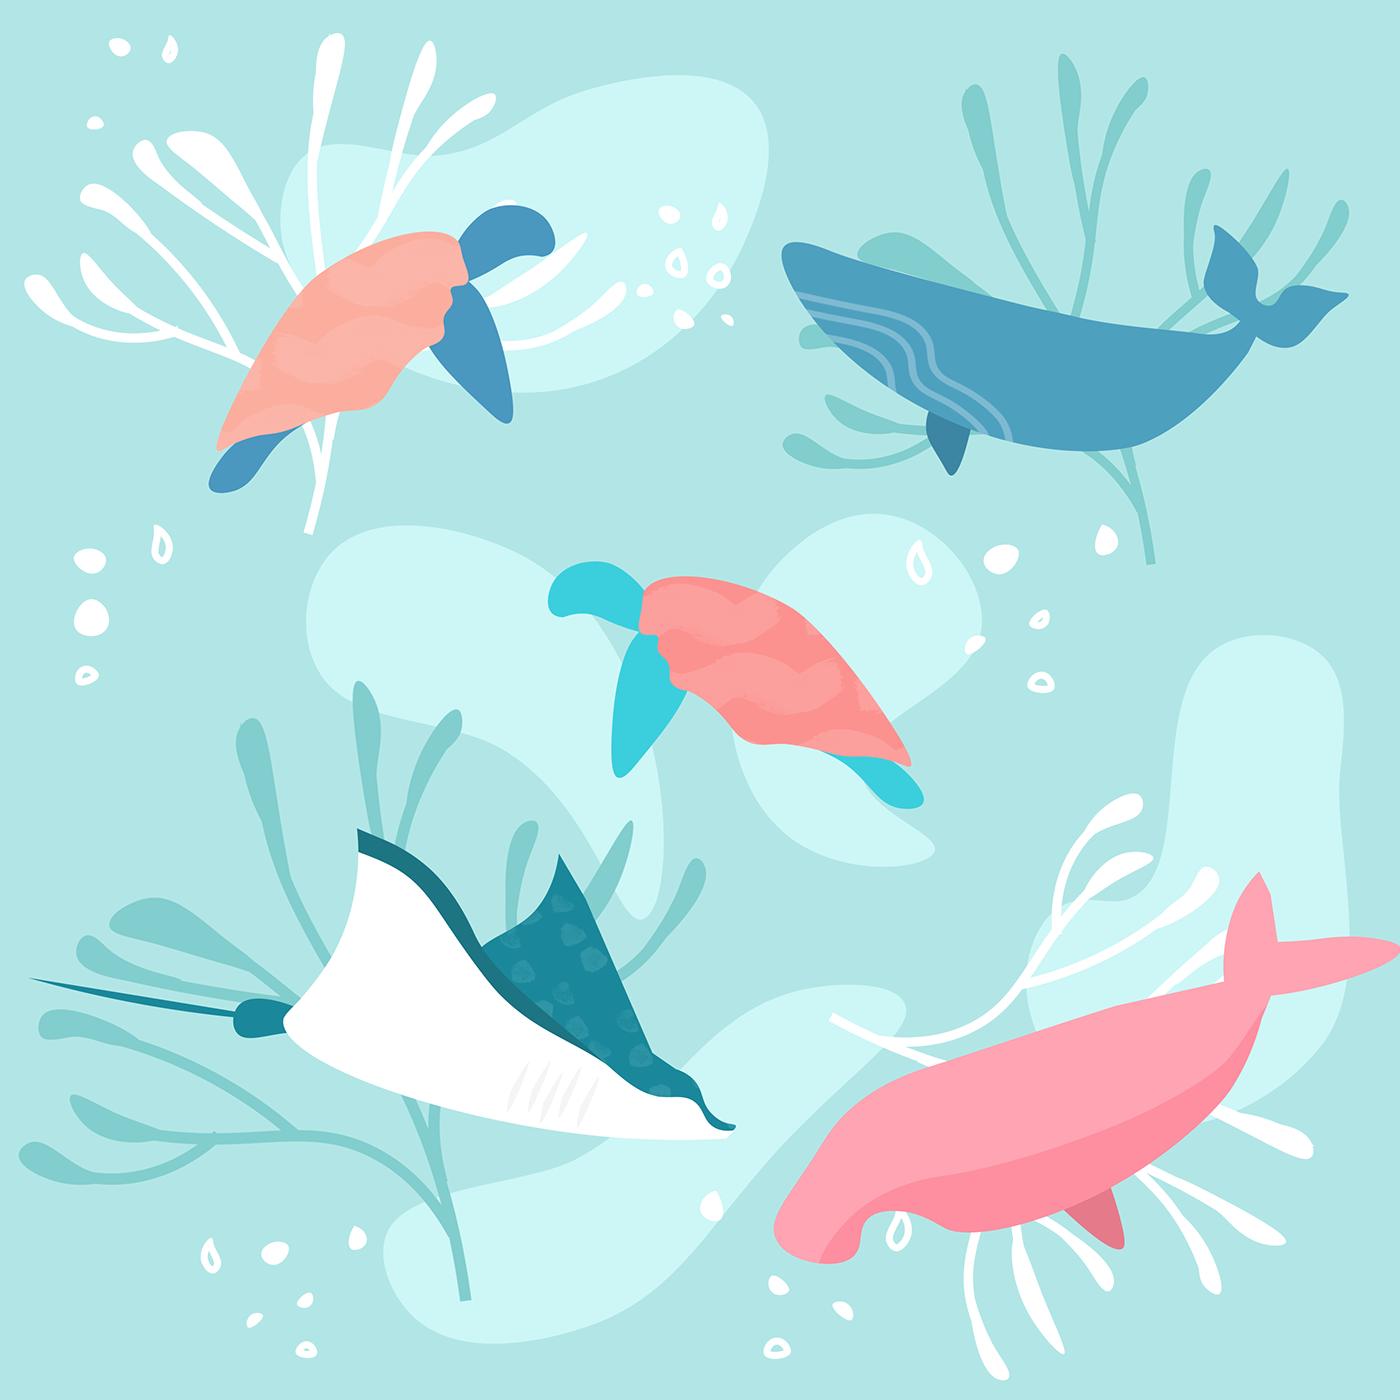 Image may contain: cartoon, bird and animal